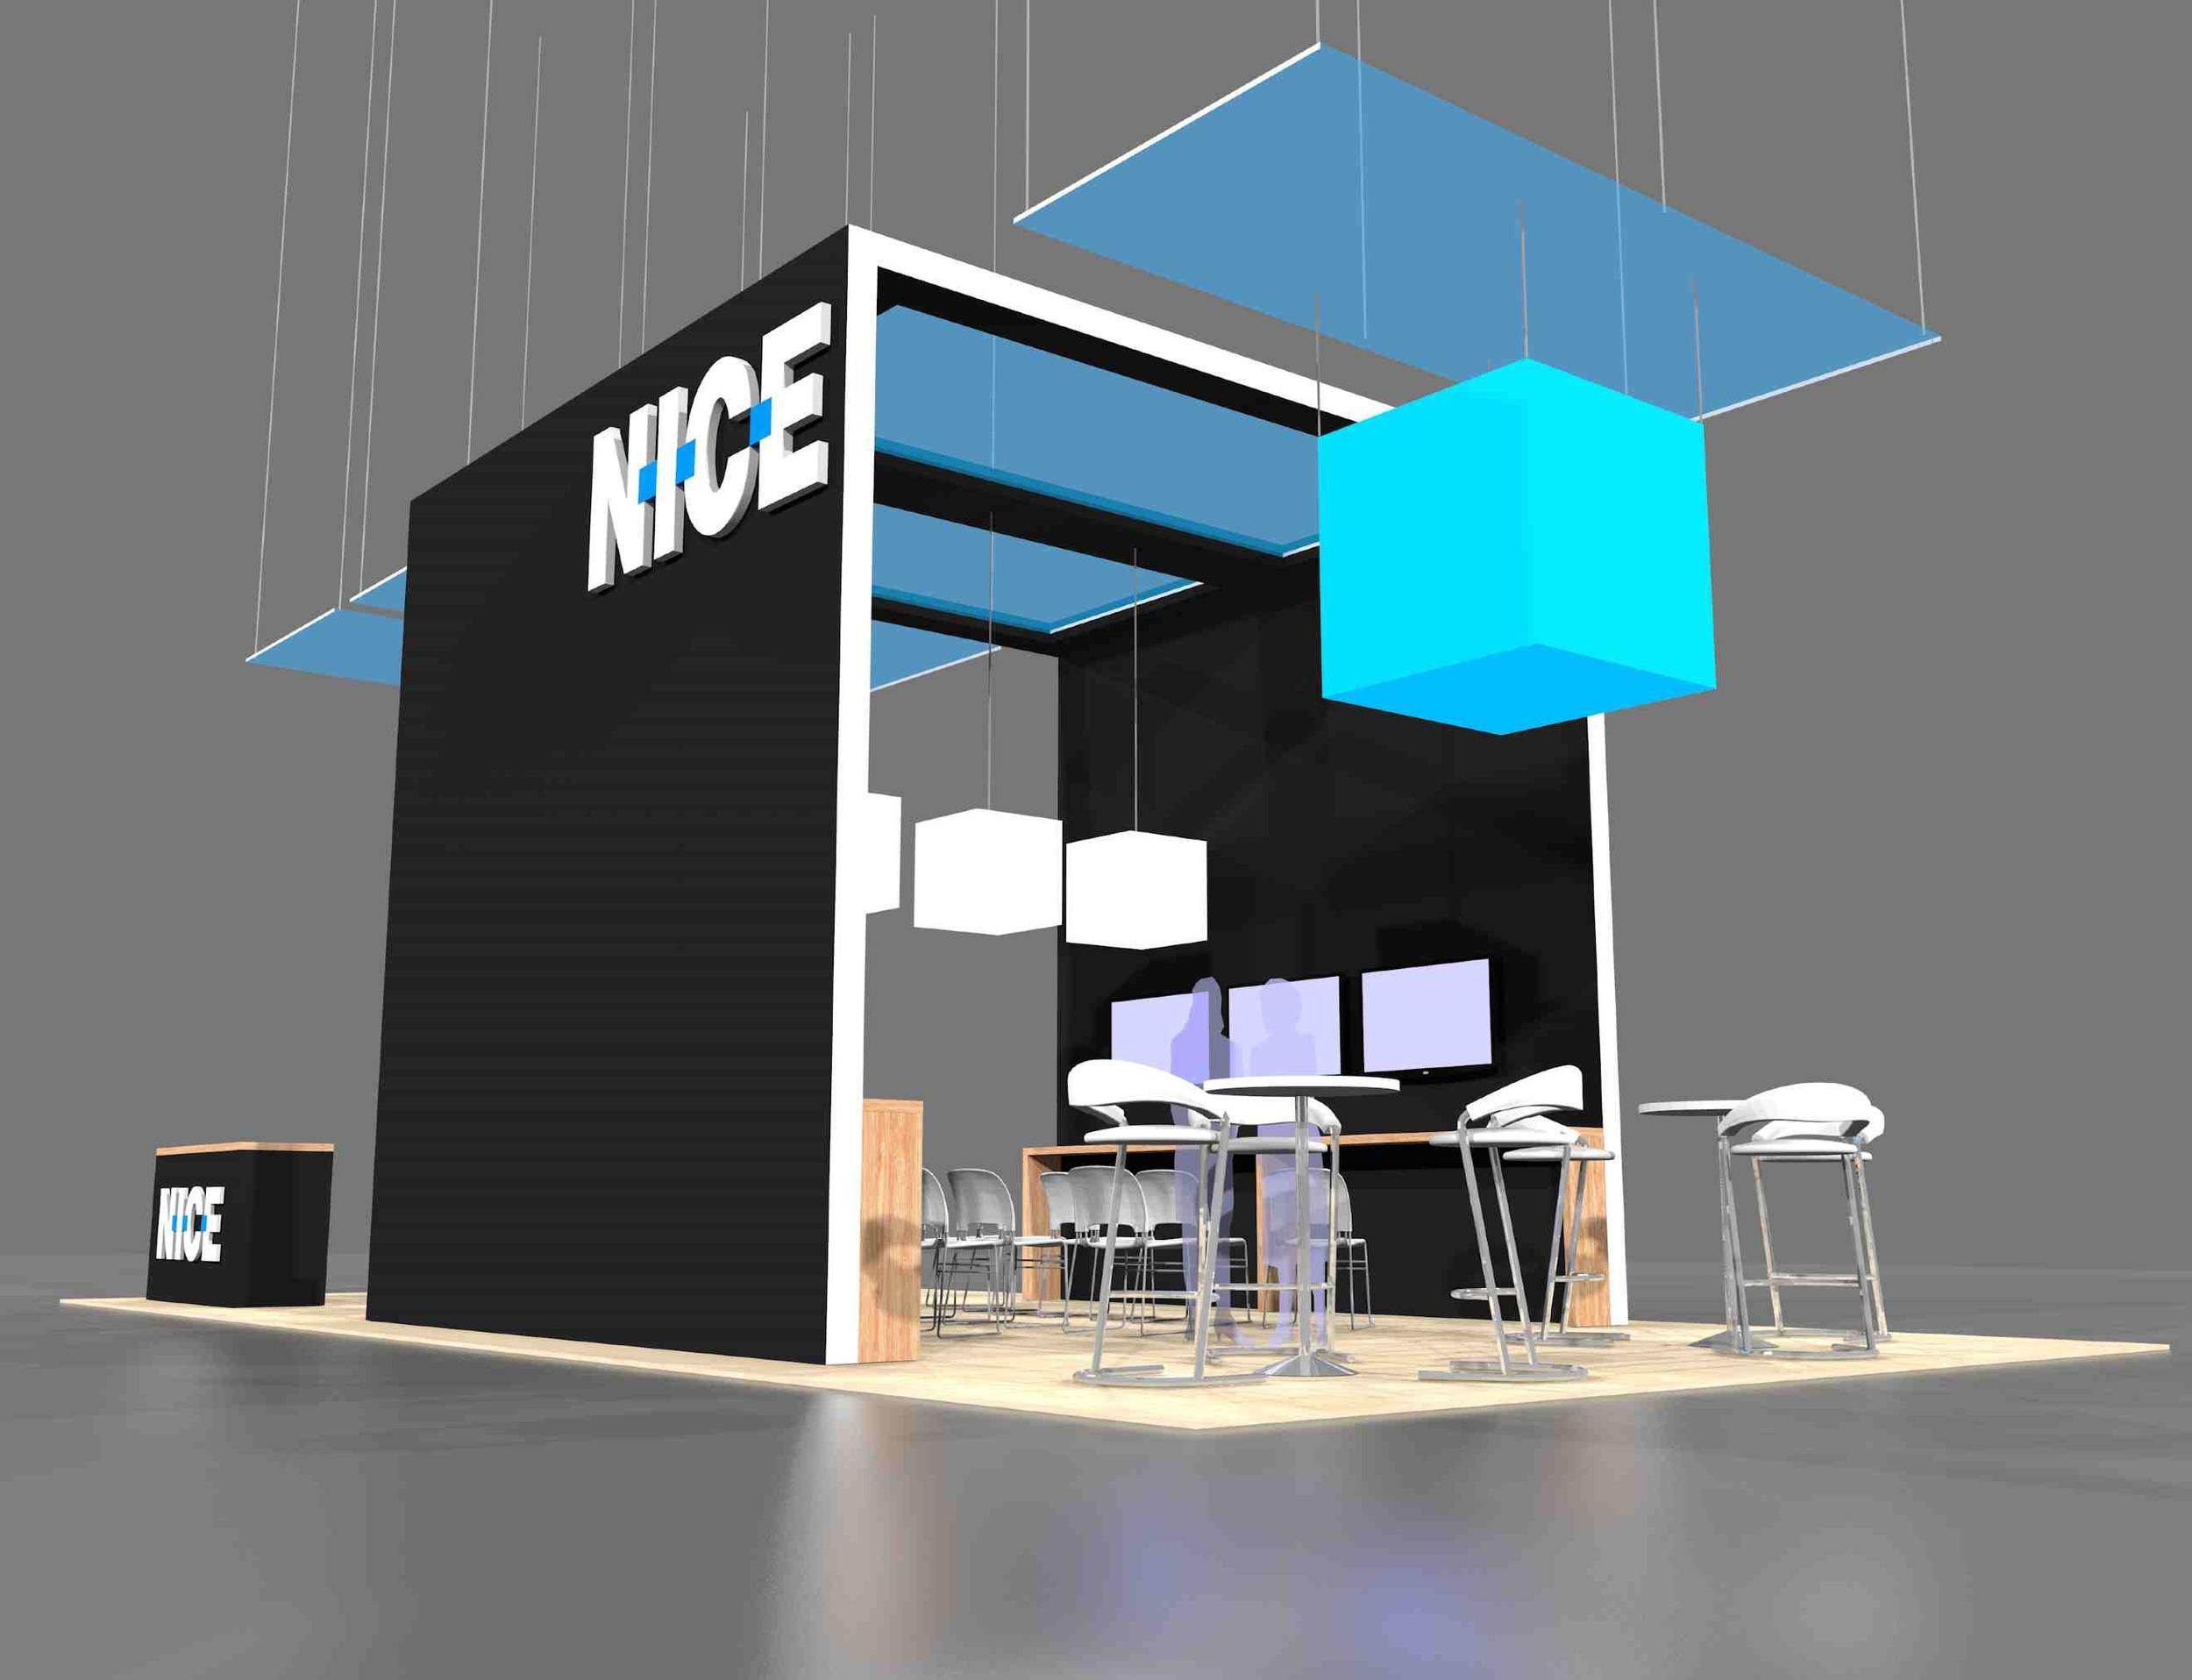 NICE_Systems_V2C.jpg